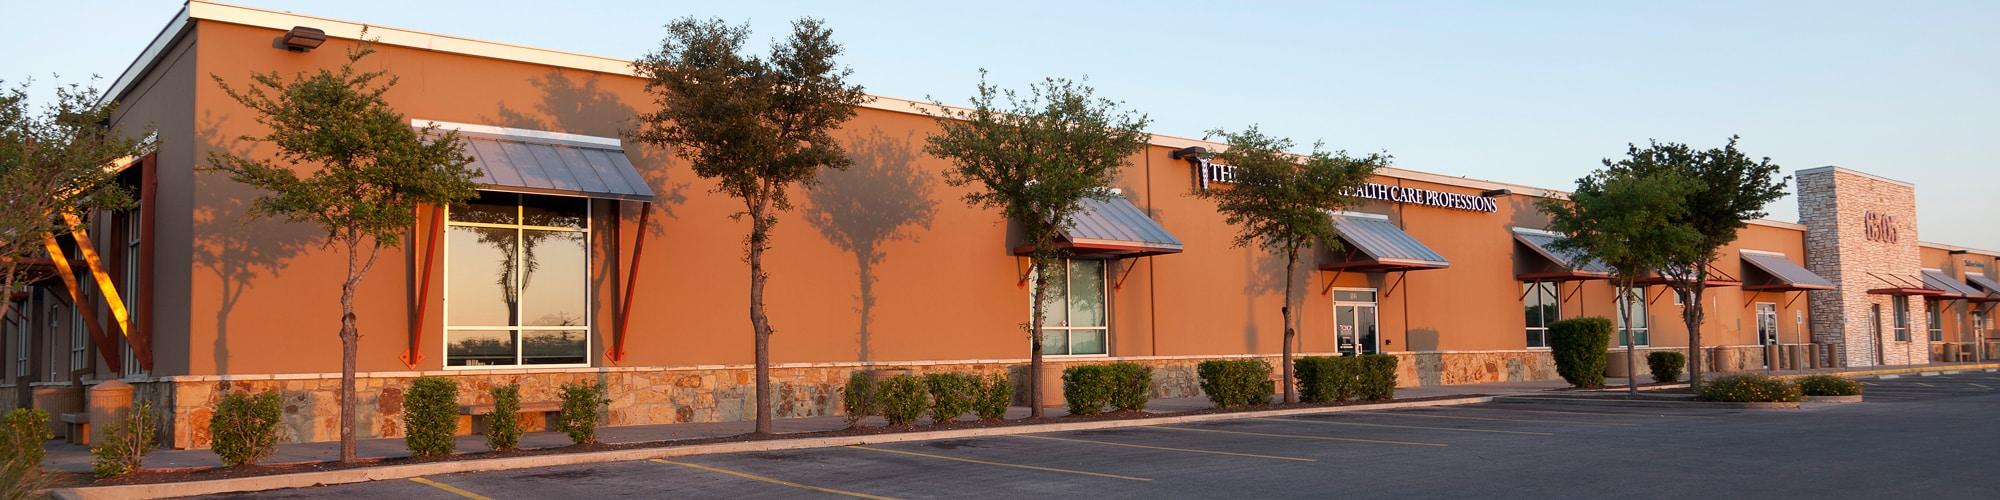 Airport Center | 6505 Airport Boulevard in Austin, Texas